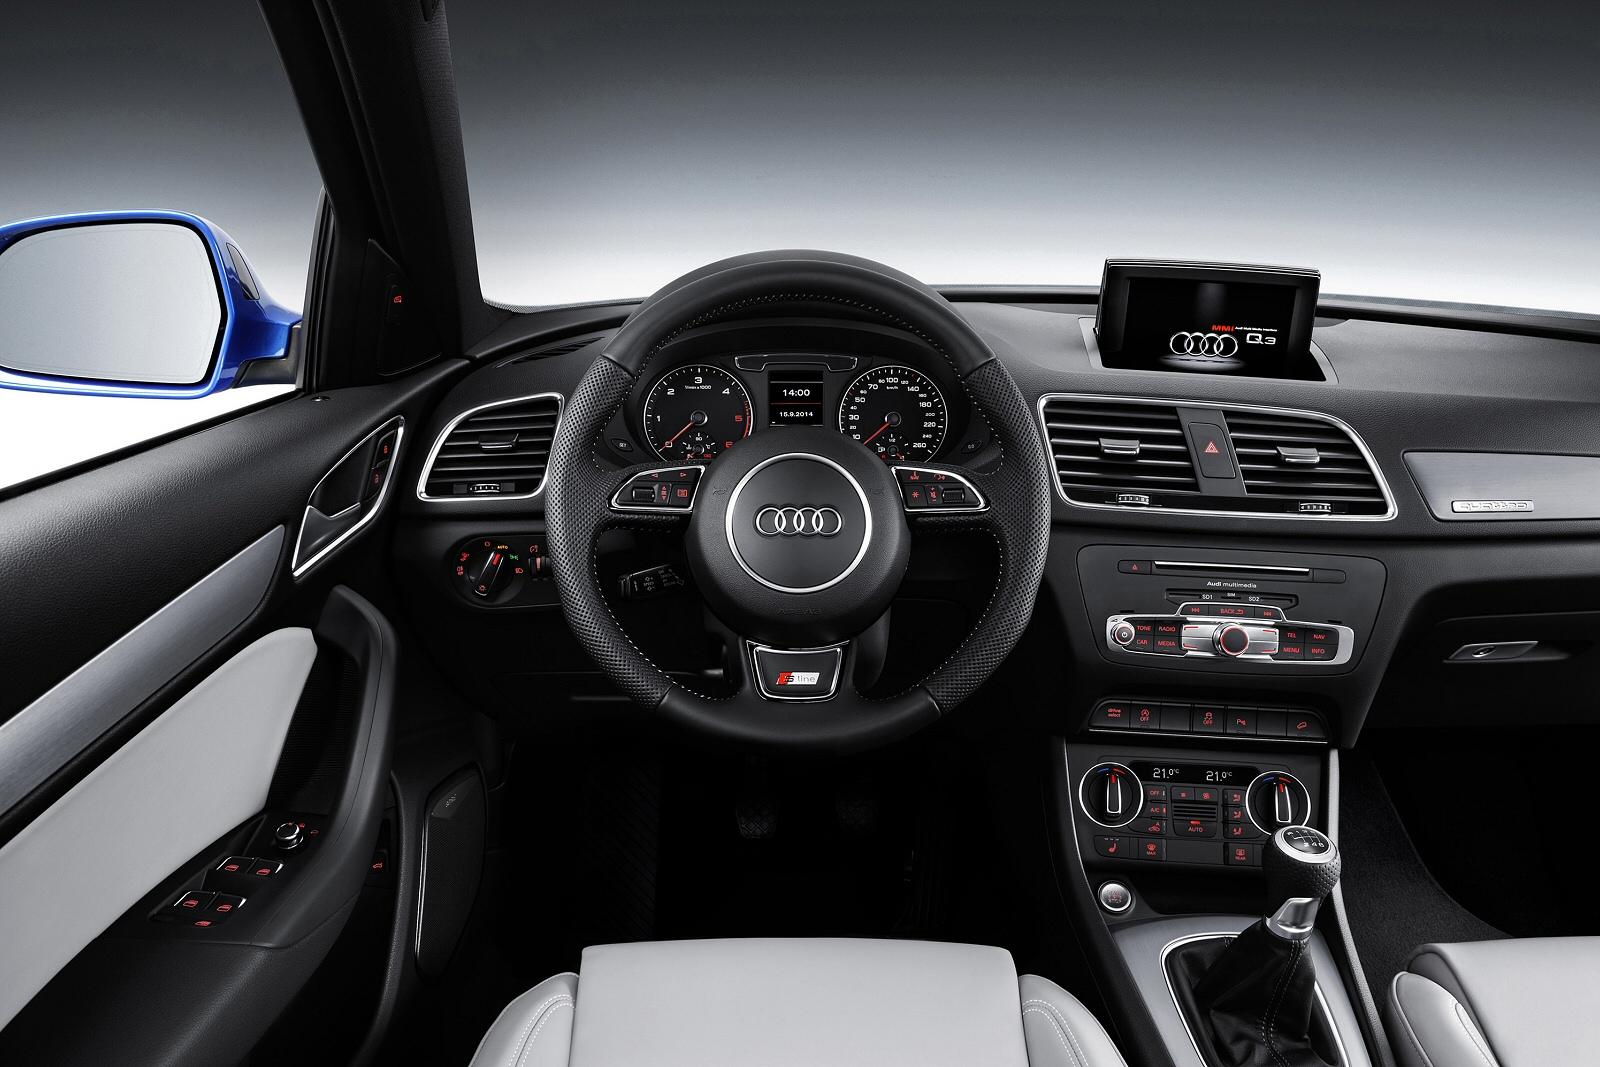 New Audi Q3 2 0 Tdi 184 Quattro S Line Edition 5dr S